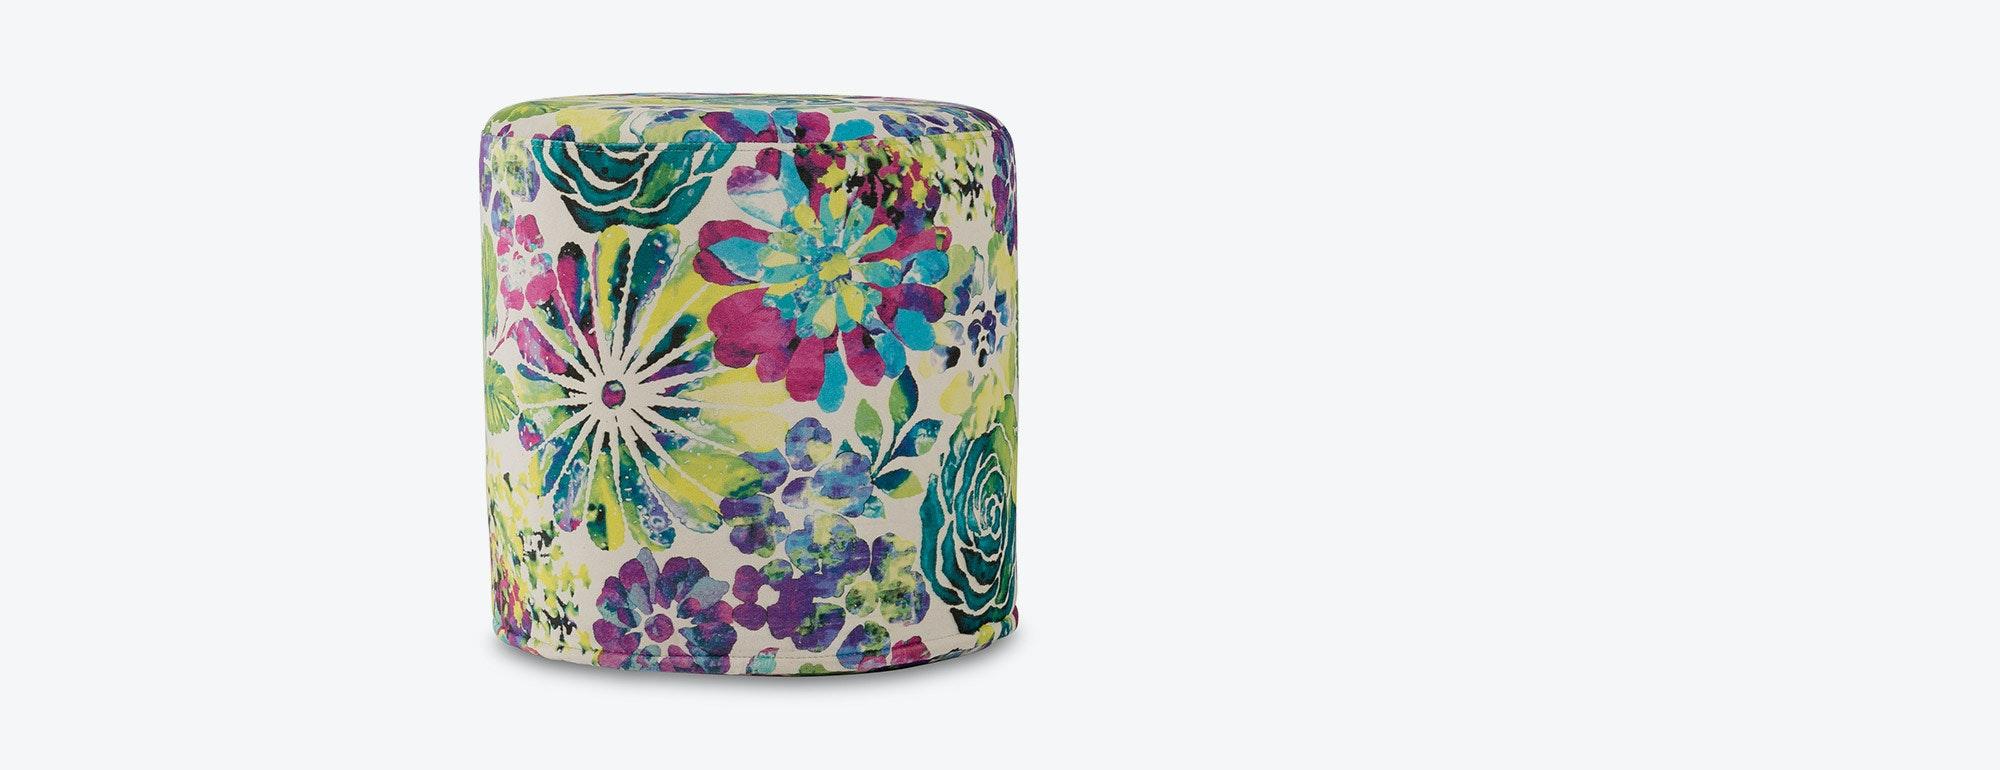 shown in Porto Floral Underwater Linen Fabric